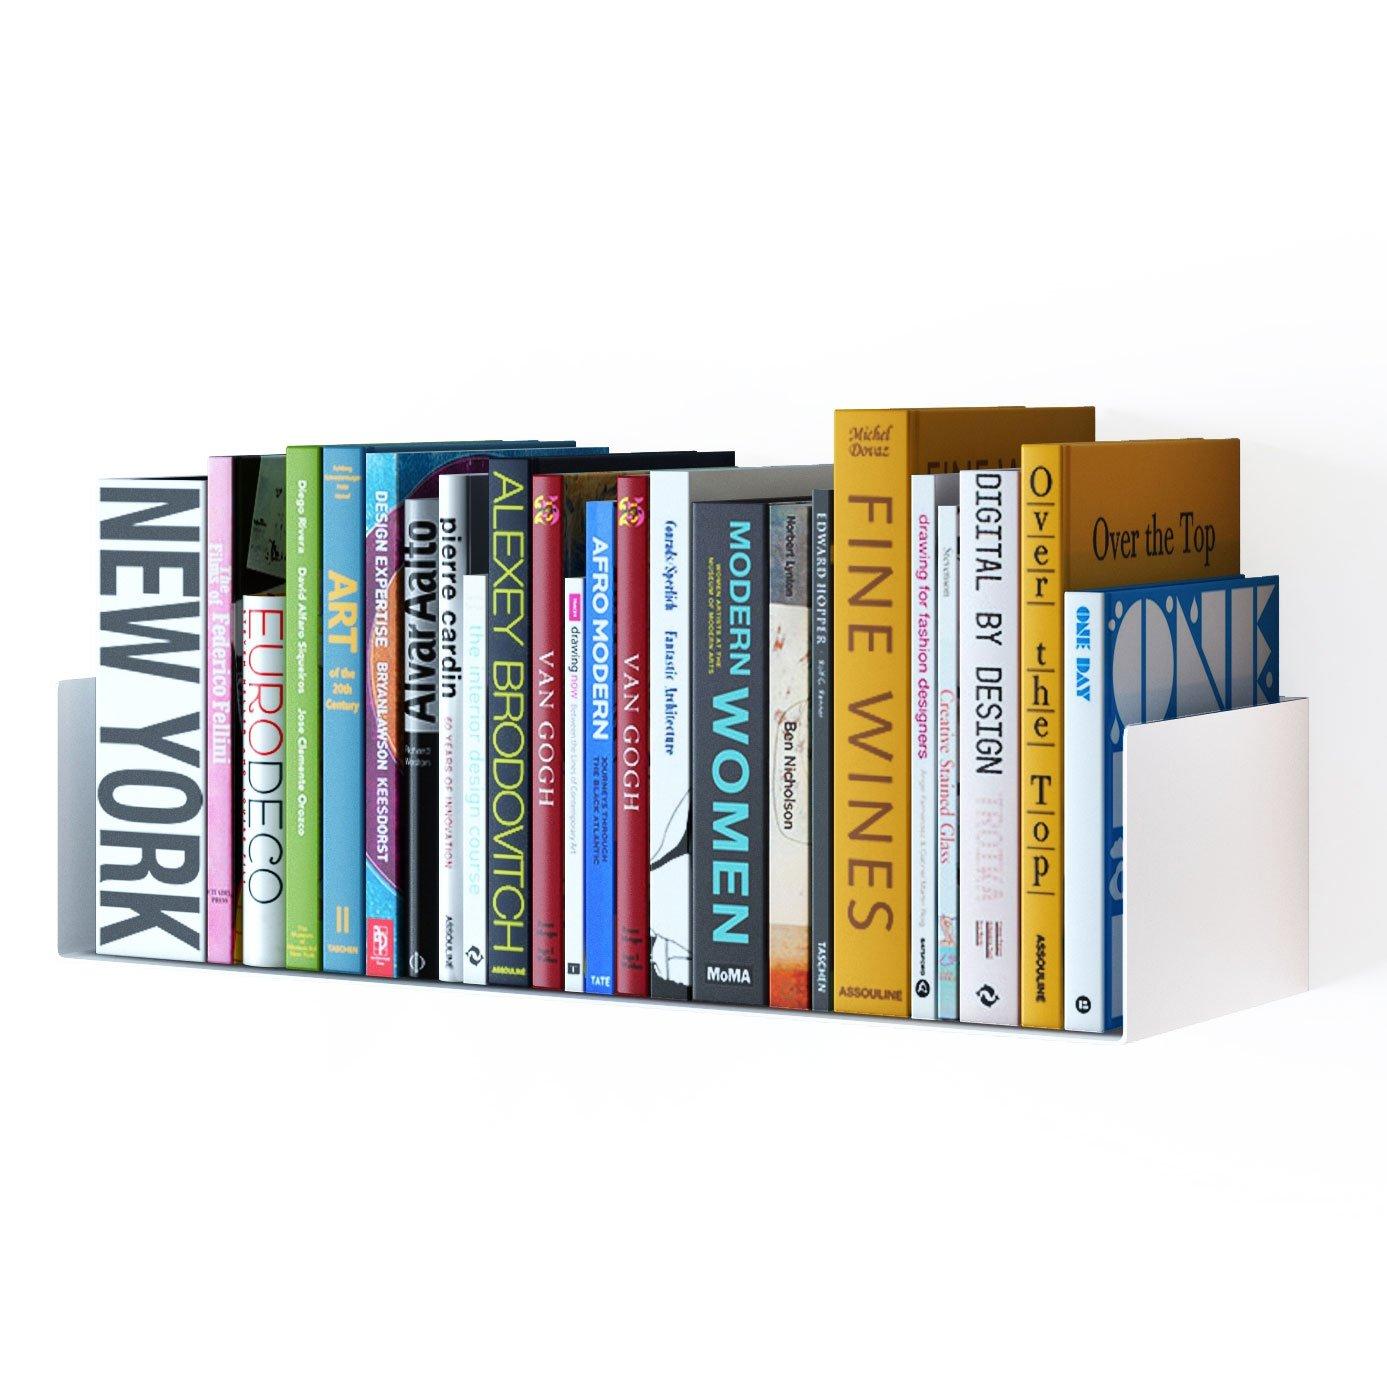 Wallniture Bali Sturdy Metal U Shape Bookshelf - Wall Mountable CD DVD Storage Multi-Purpose Display Rack in White